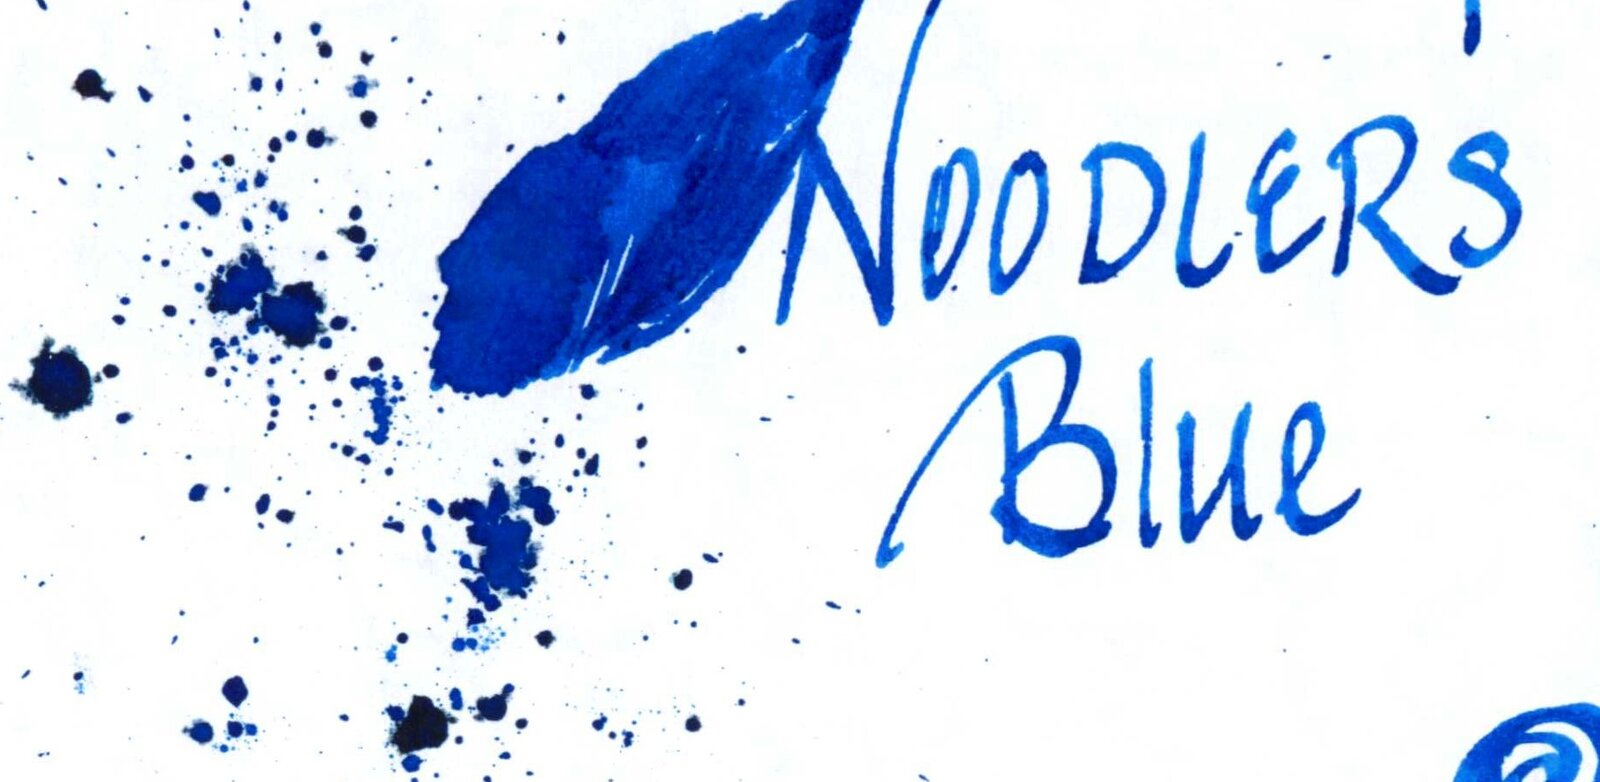 Noodlers_Blue.jpg